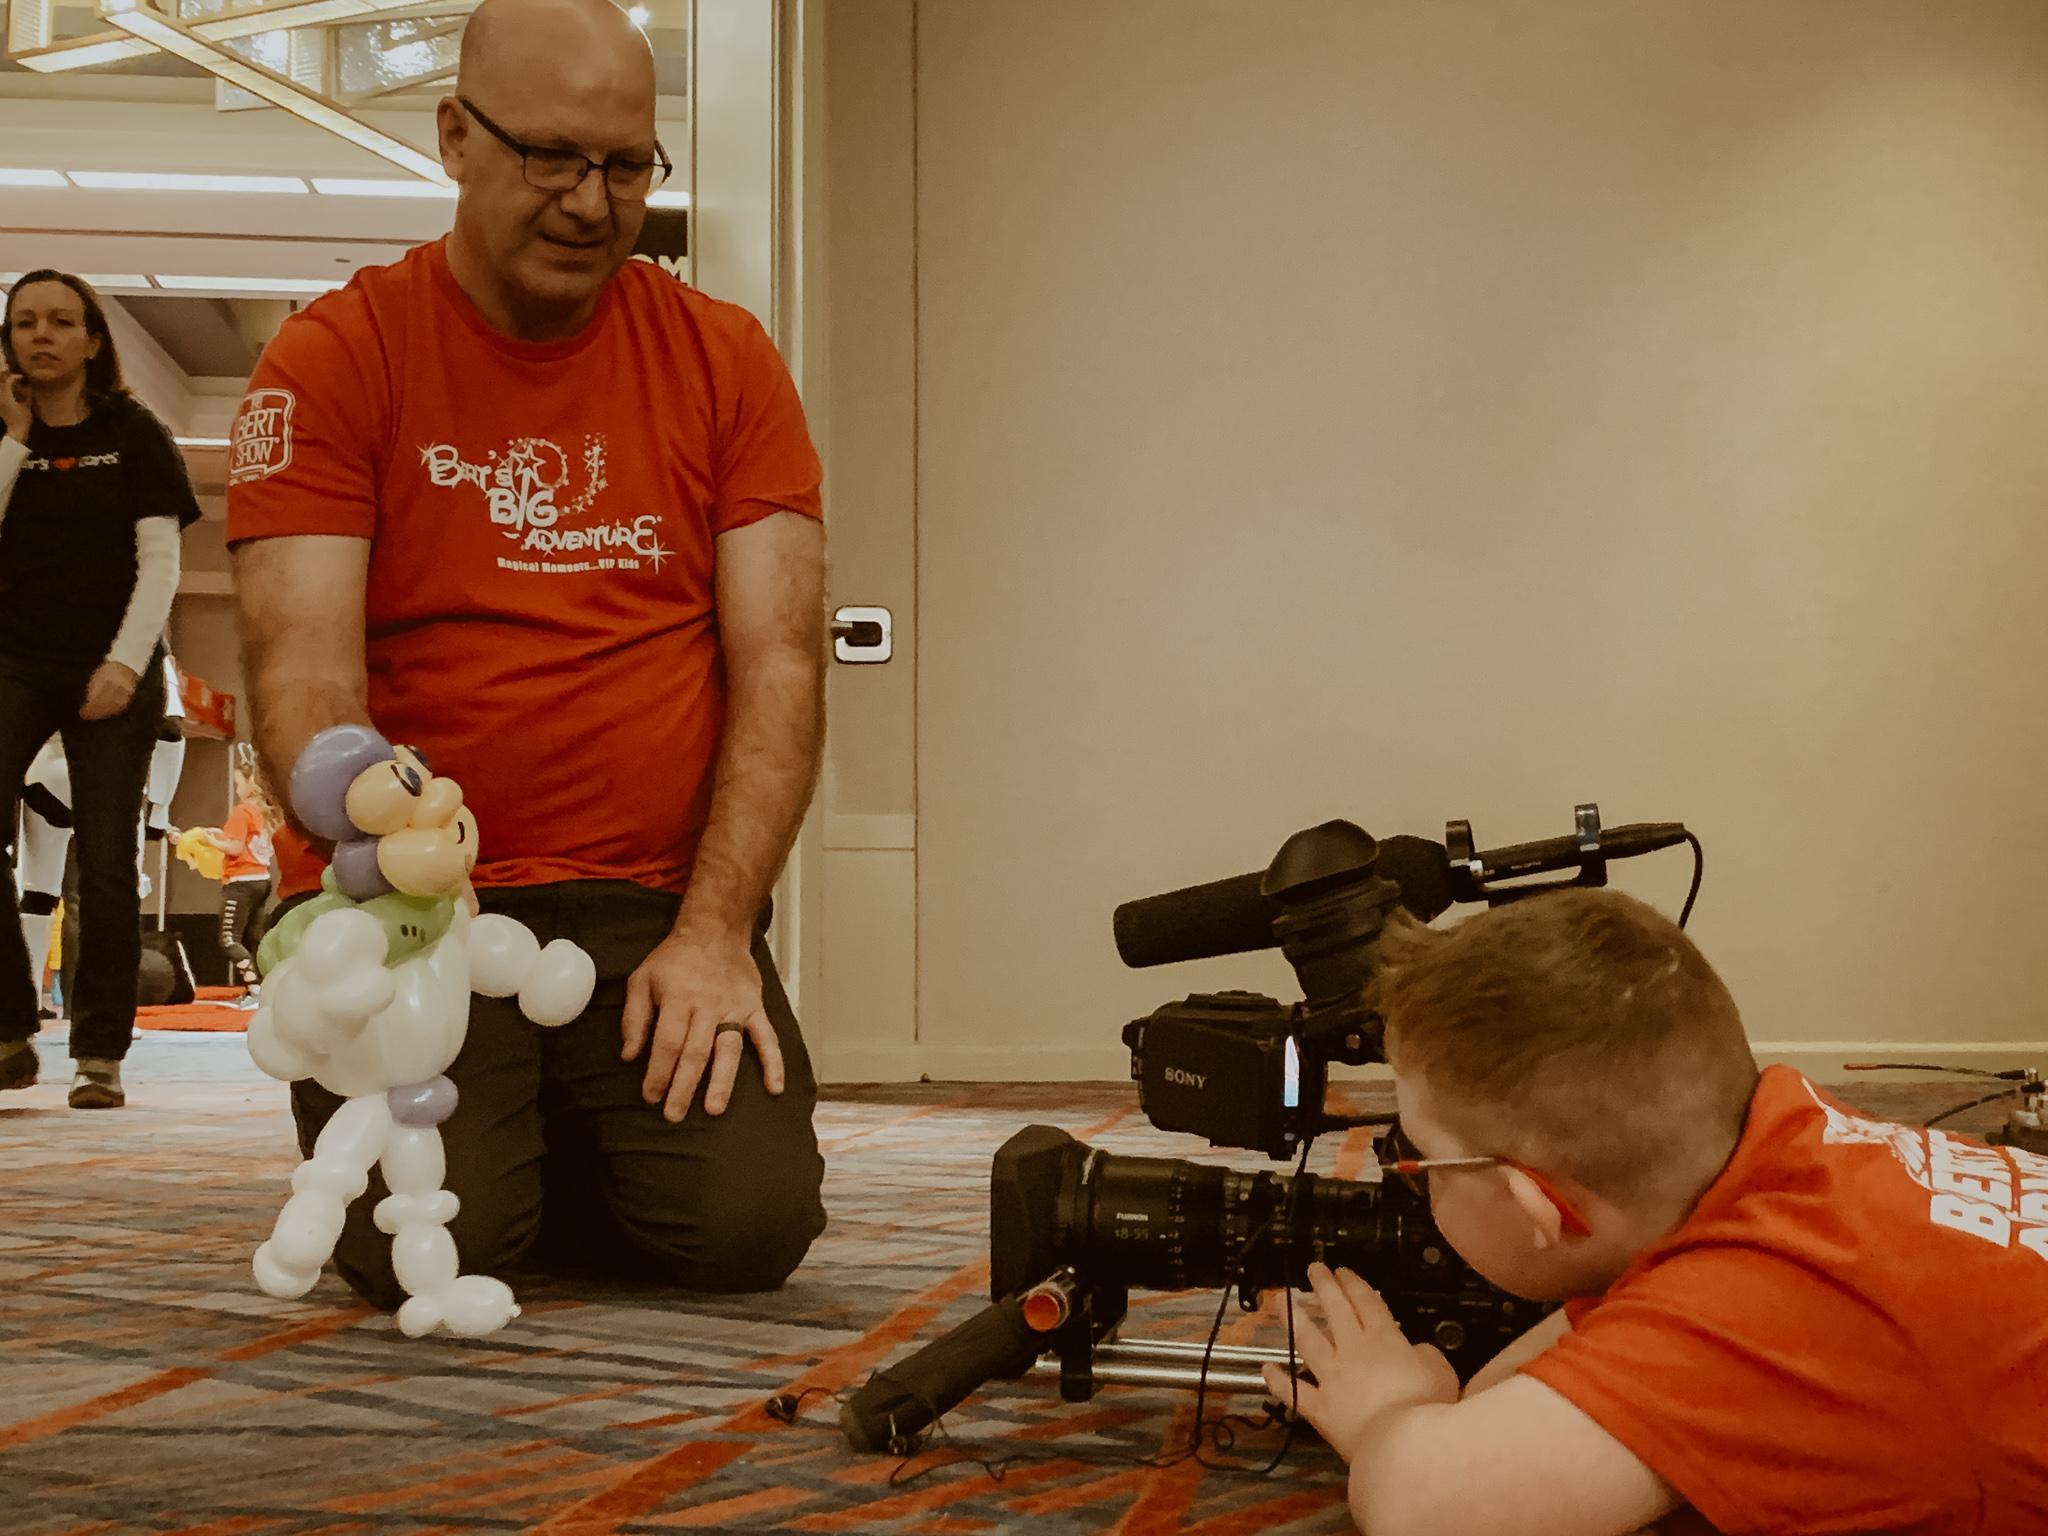 Go To Team Atlanta Crew | CNN: Bert's Big Adventure